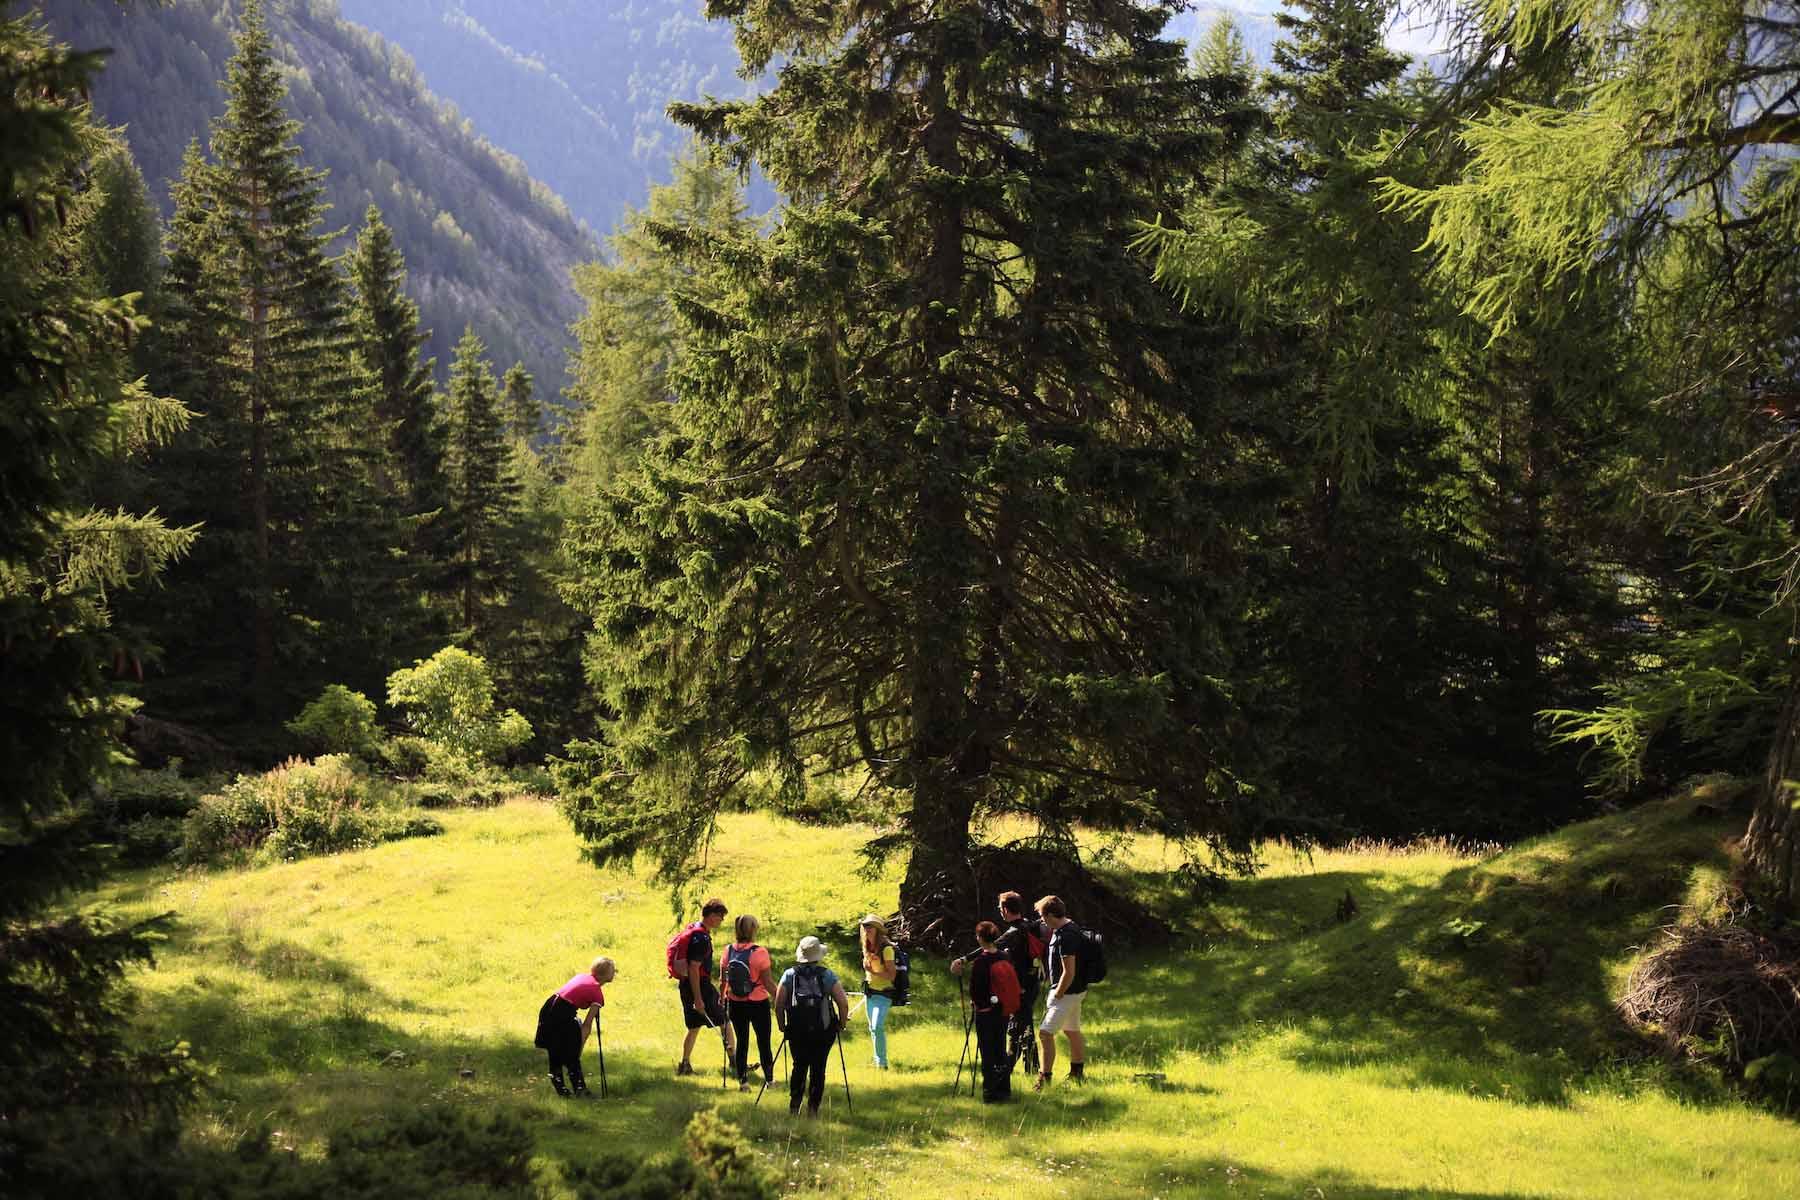 Forest walk in Kals Am Grossglockner